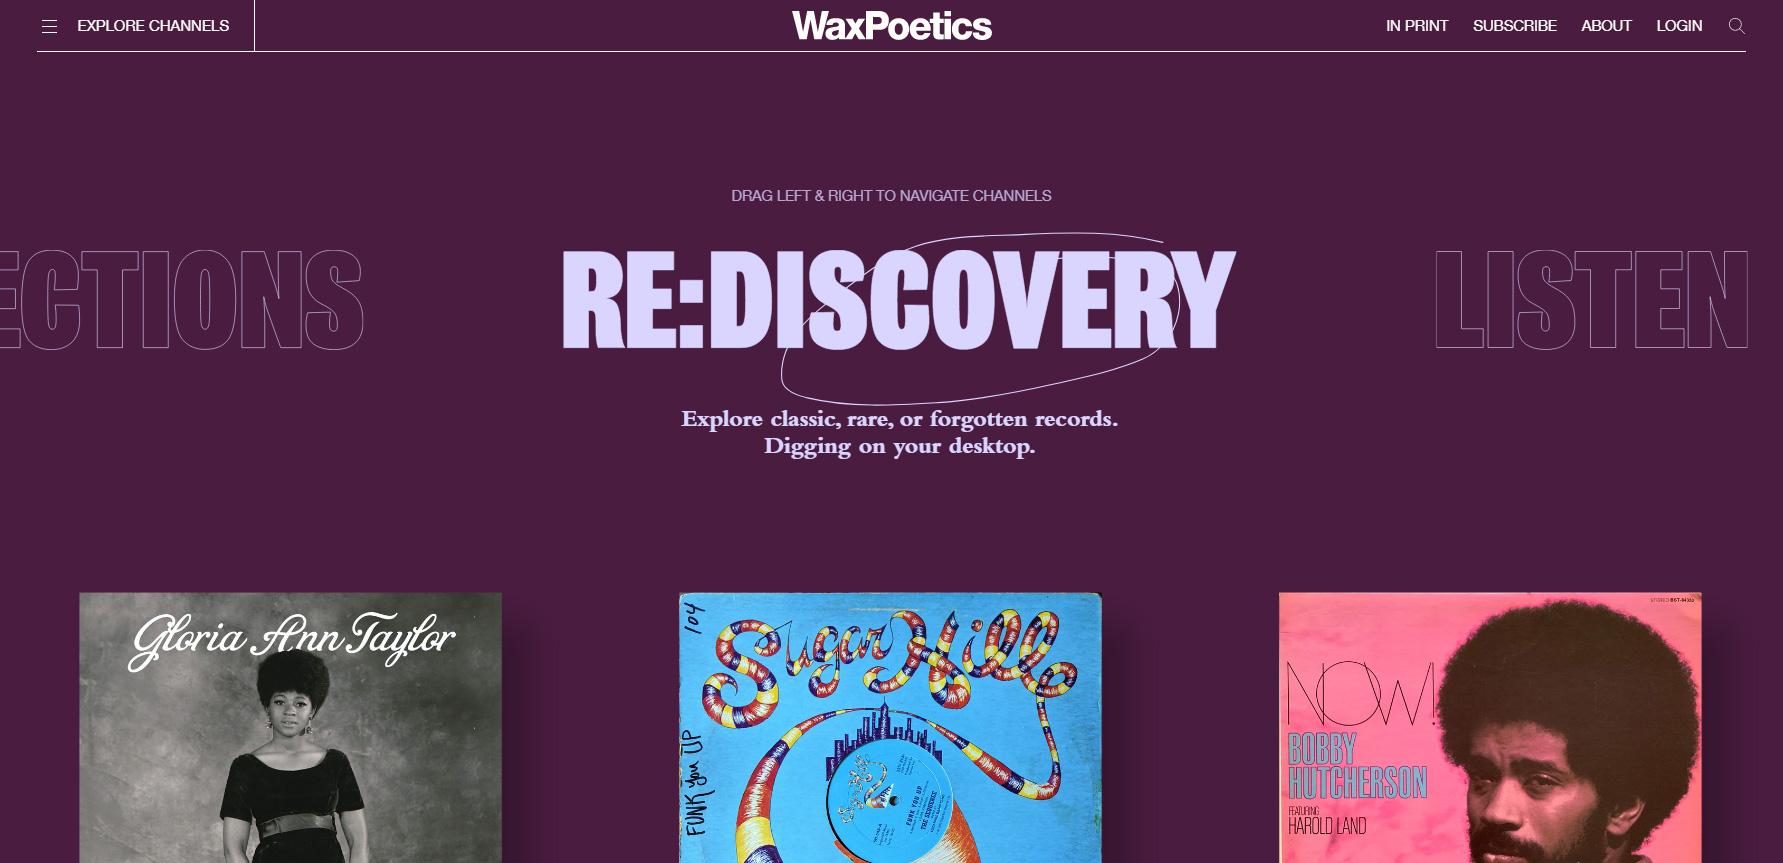 Wax Poetics - Website of the Day